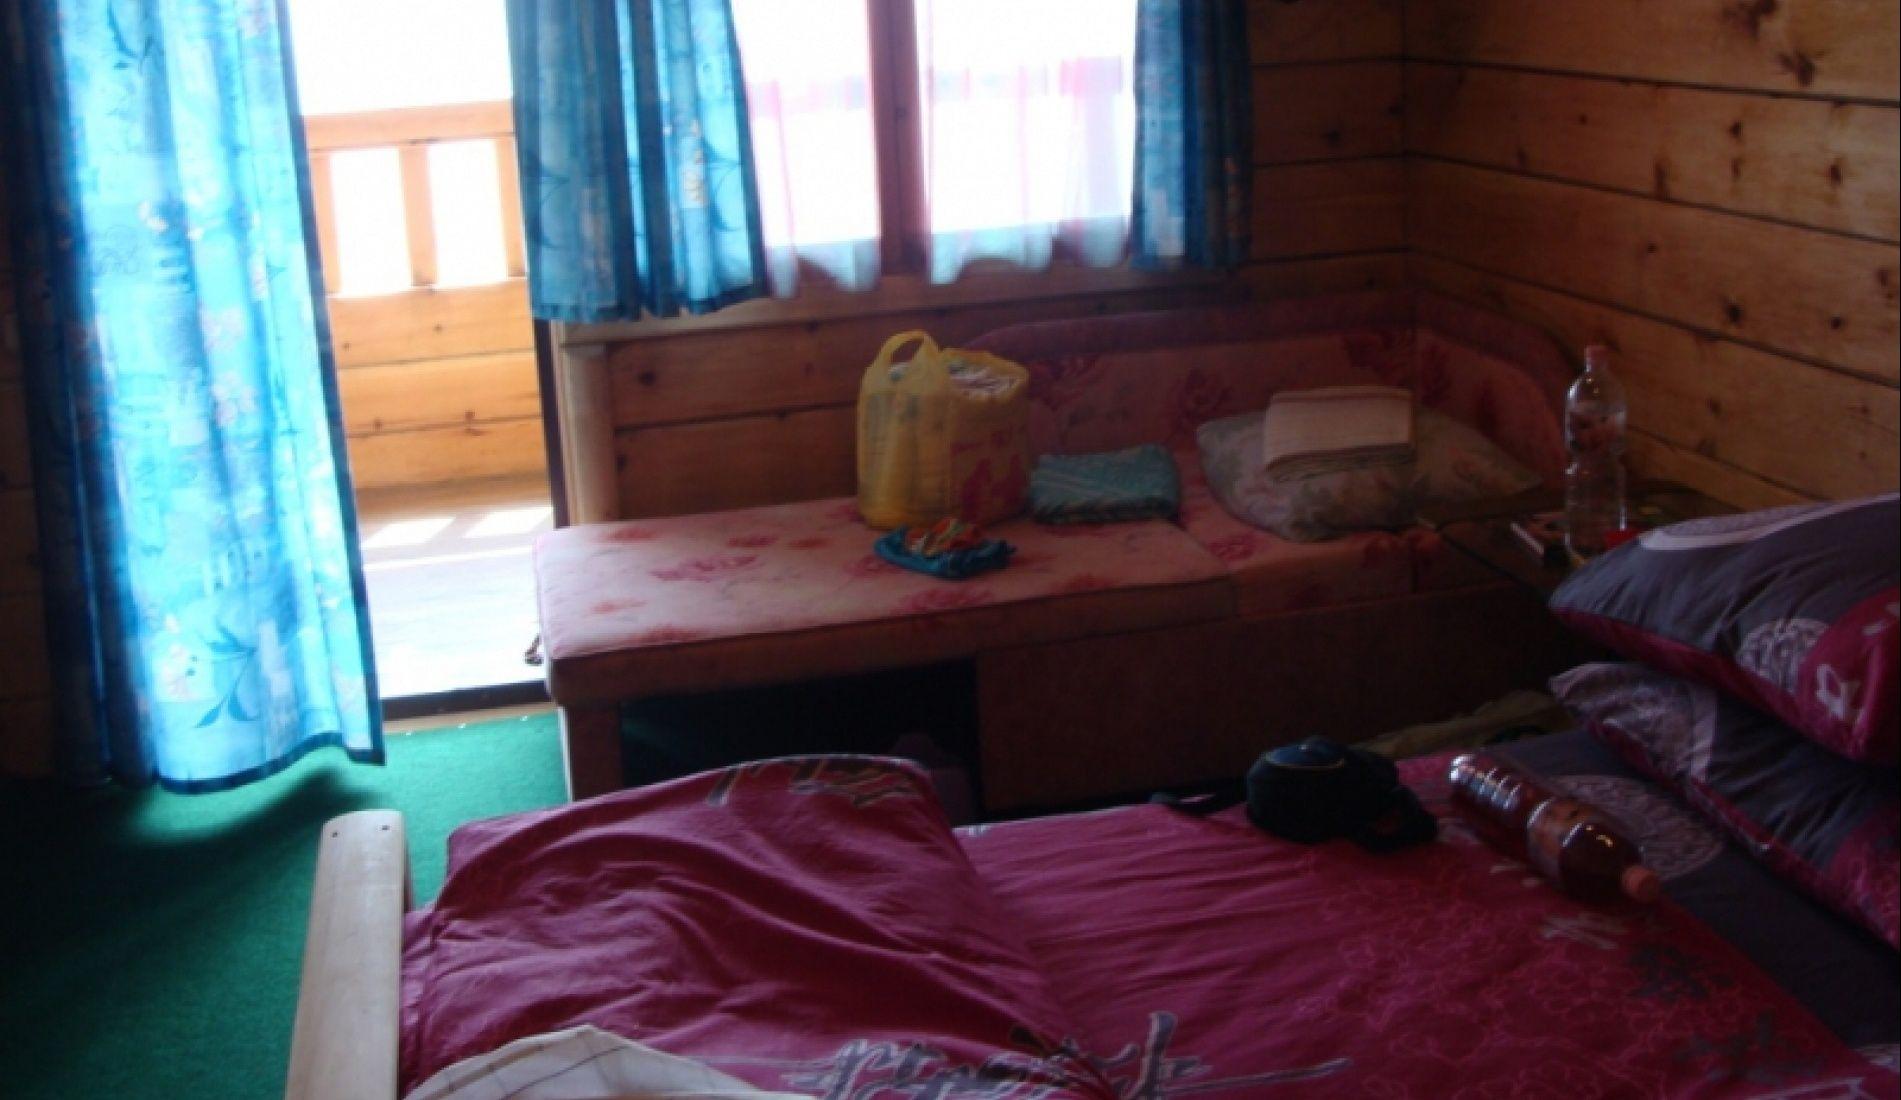 "База отдыха ""Маяк"" Приморский край 3-х местная комната в 2-х этажном доме, фото 1"